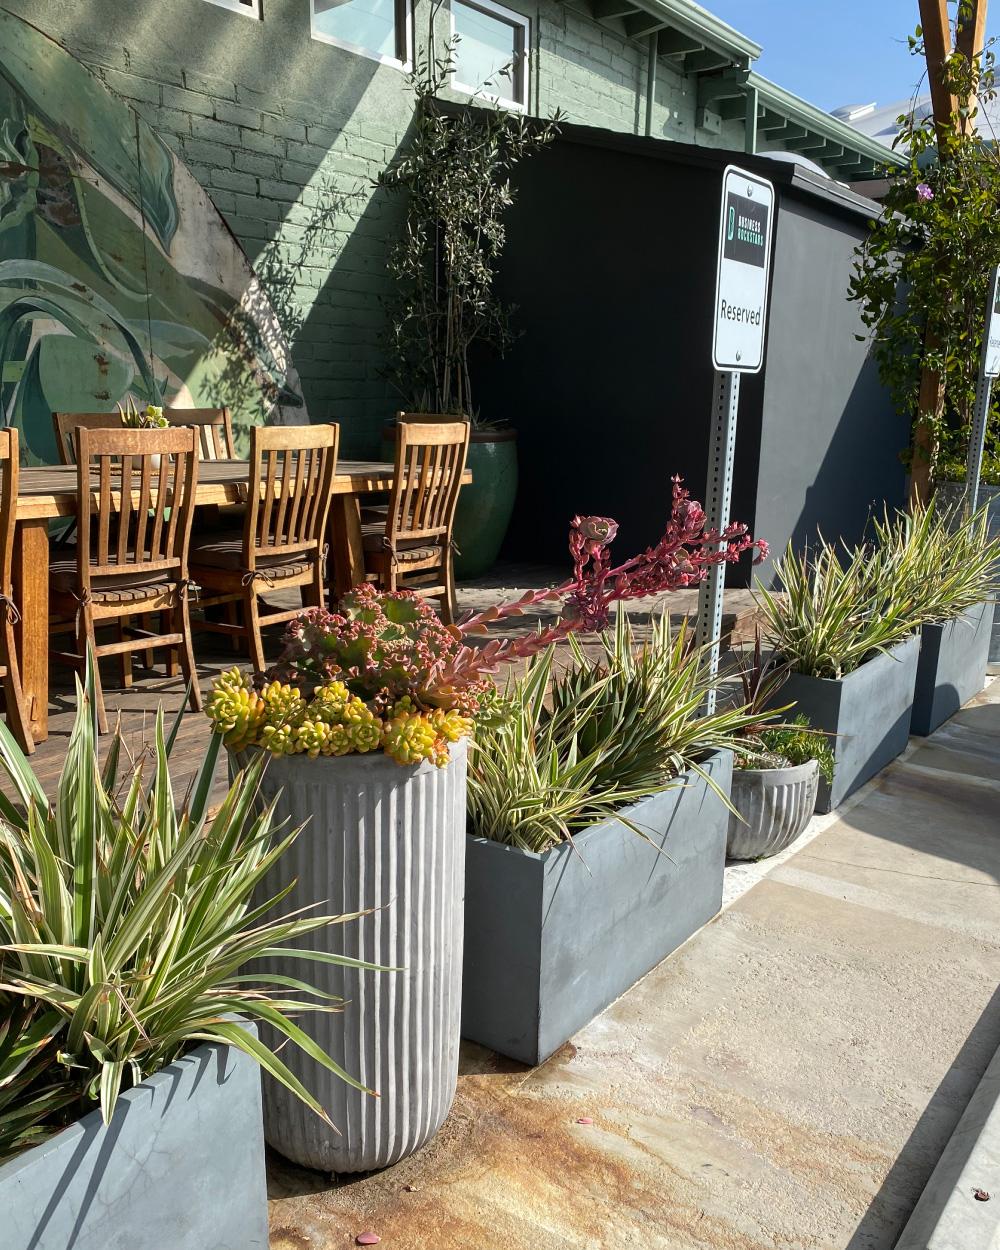 Outdoor plants arranged together